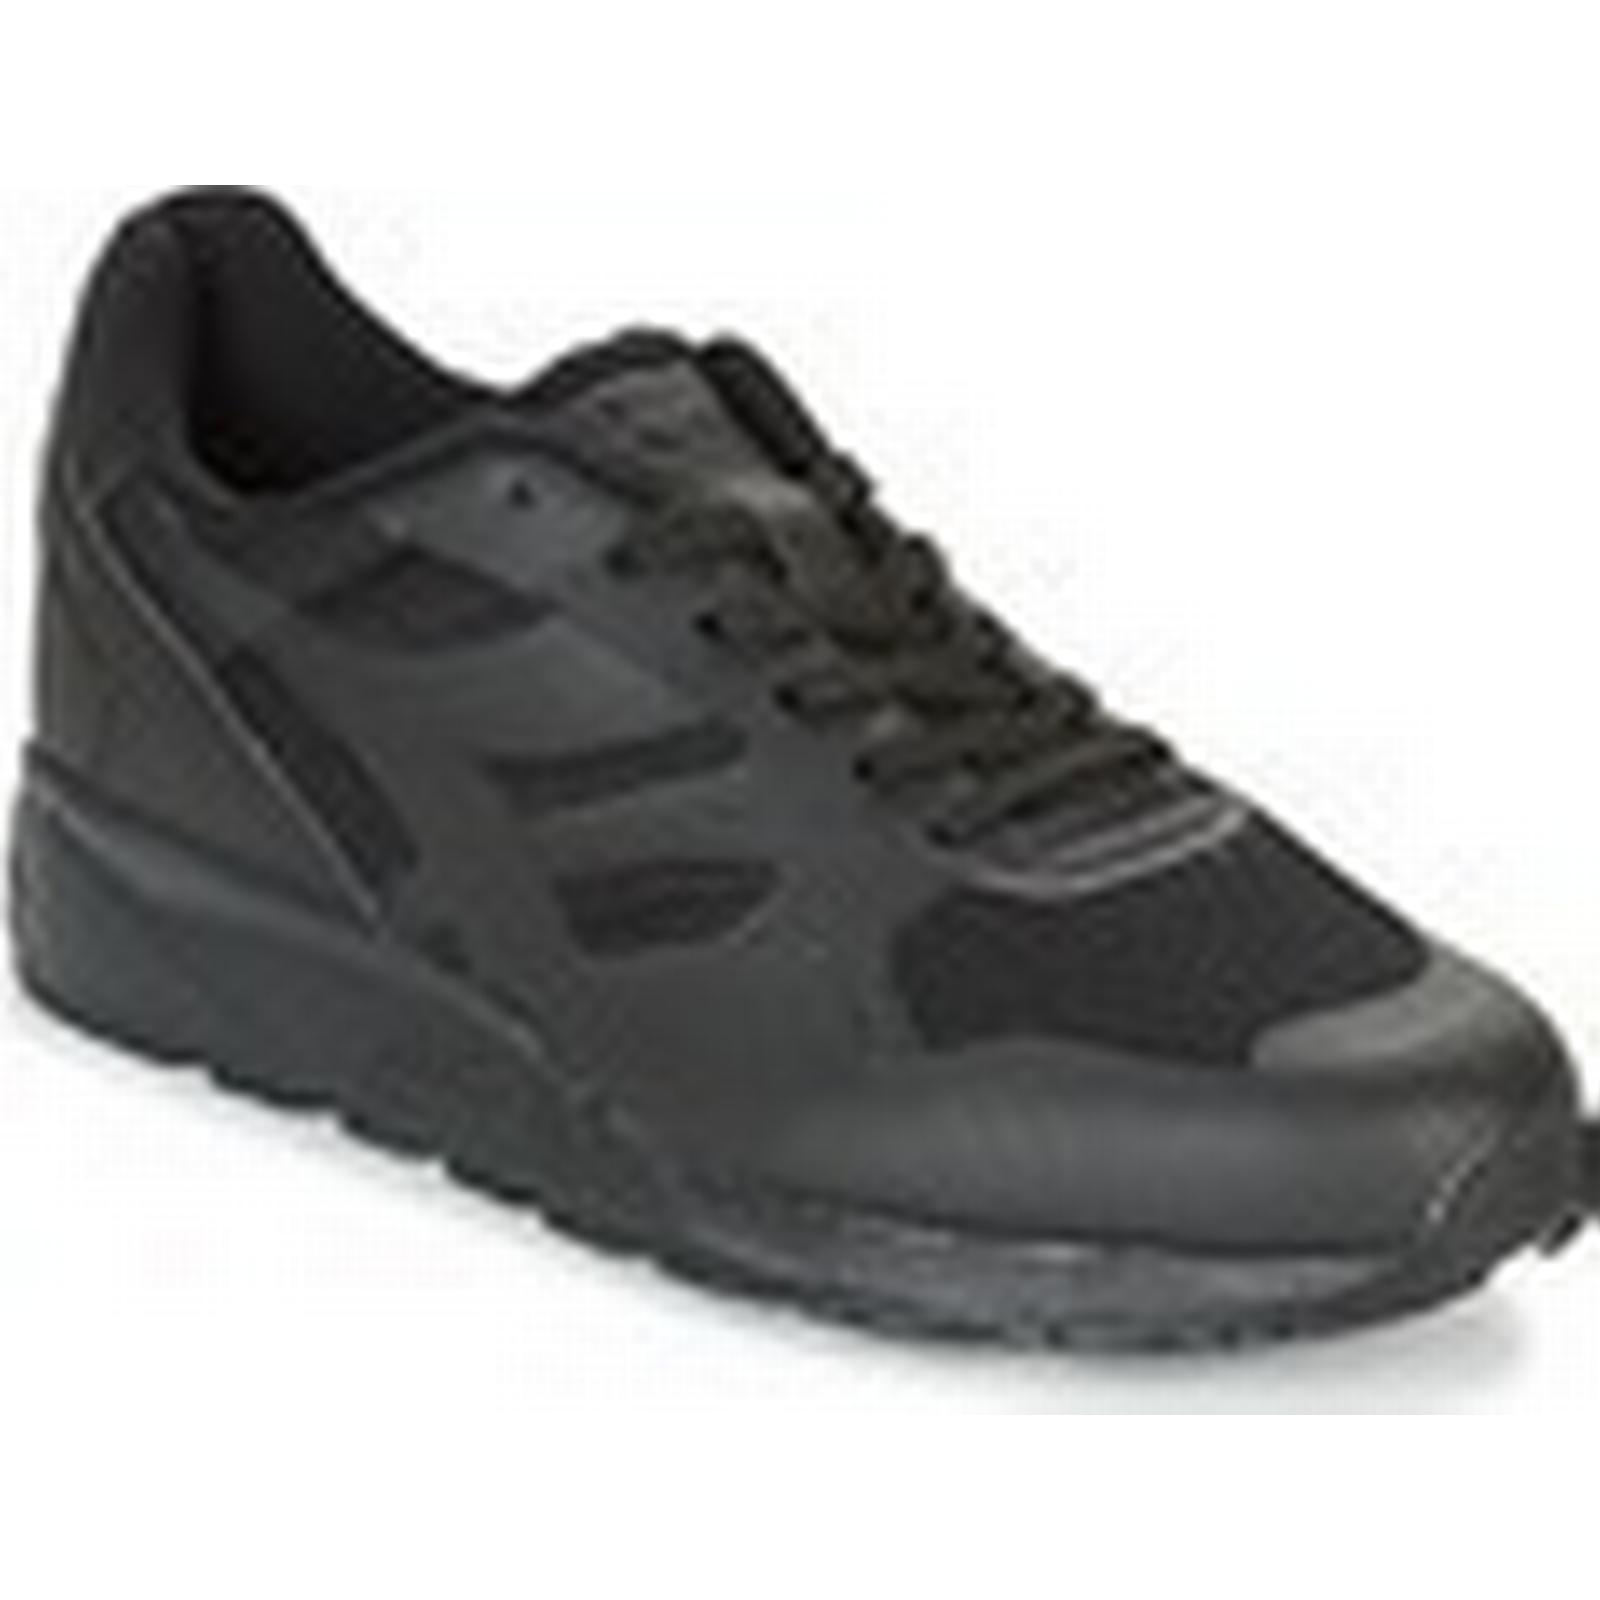 diadora n902 femmes mm femmes n902 & #  27; s Chaussure s (formateurs) en noir 423e5c